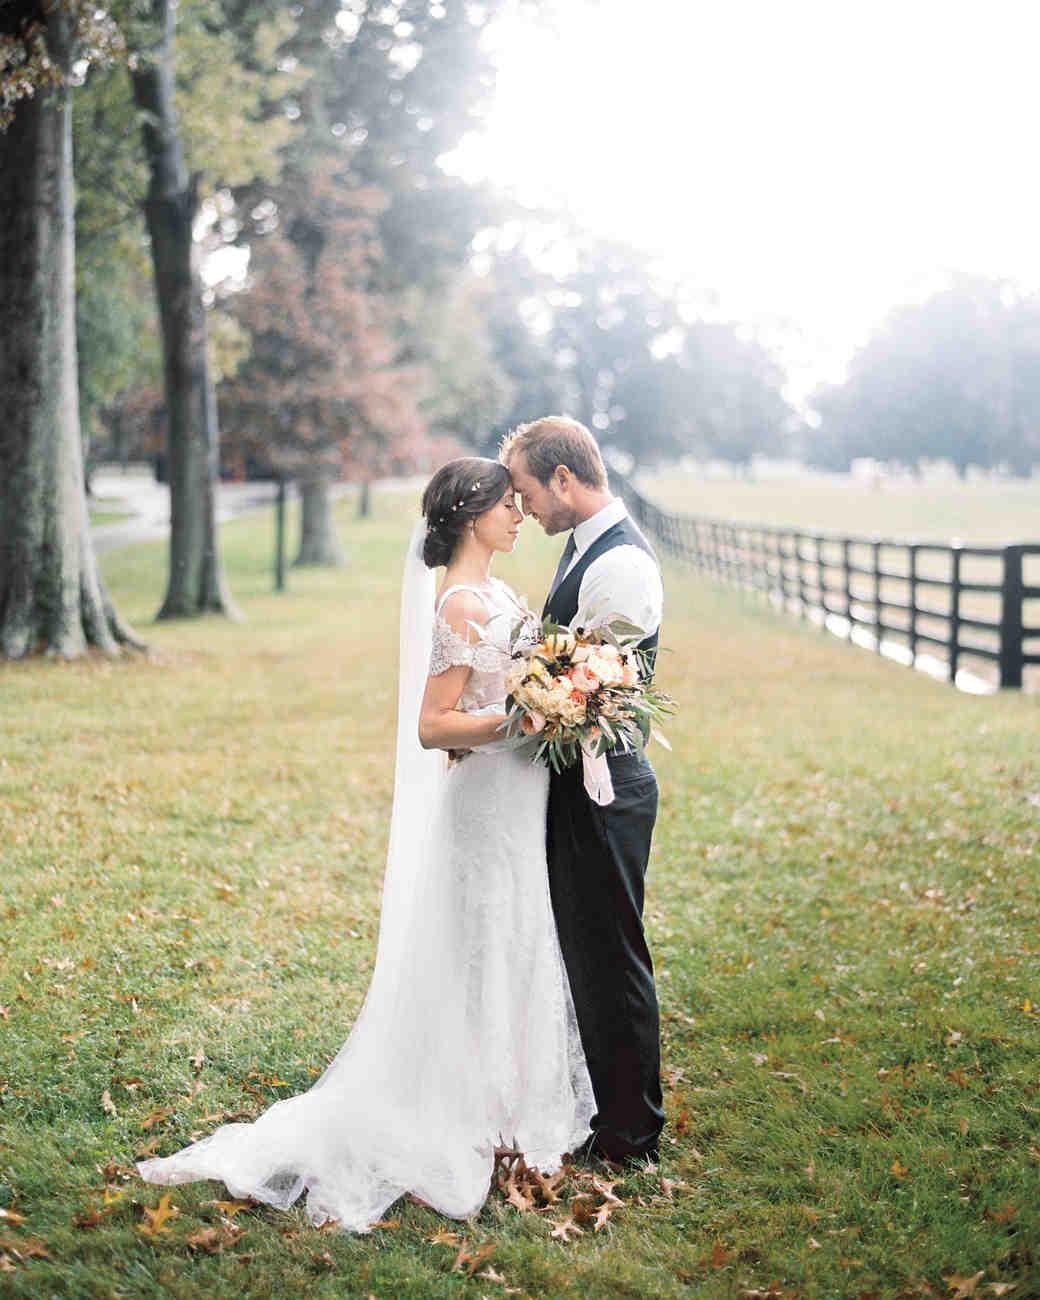 bride-groom-blaine-carson-wedding-194-mwds110873.jpg